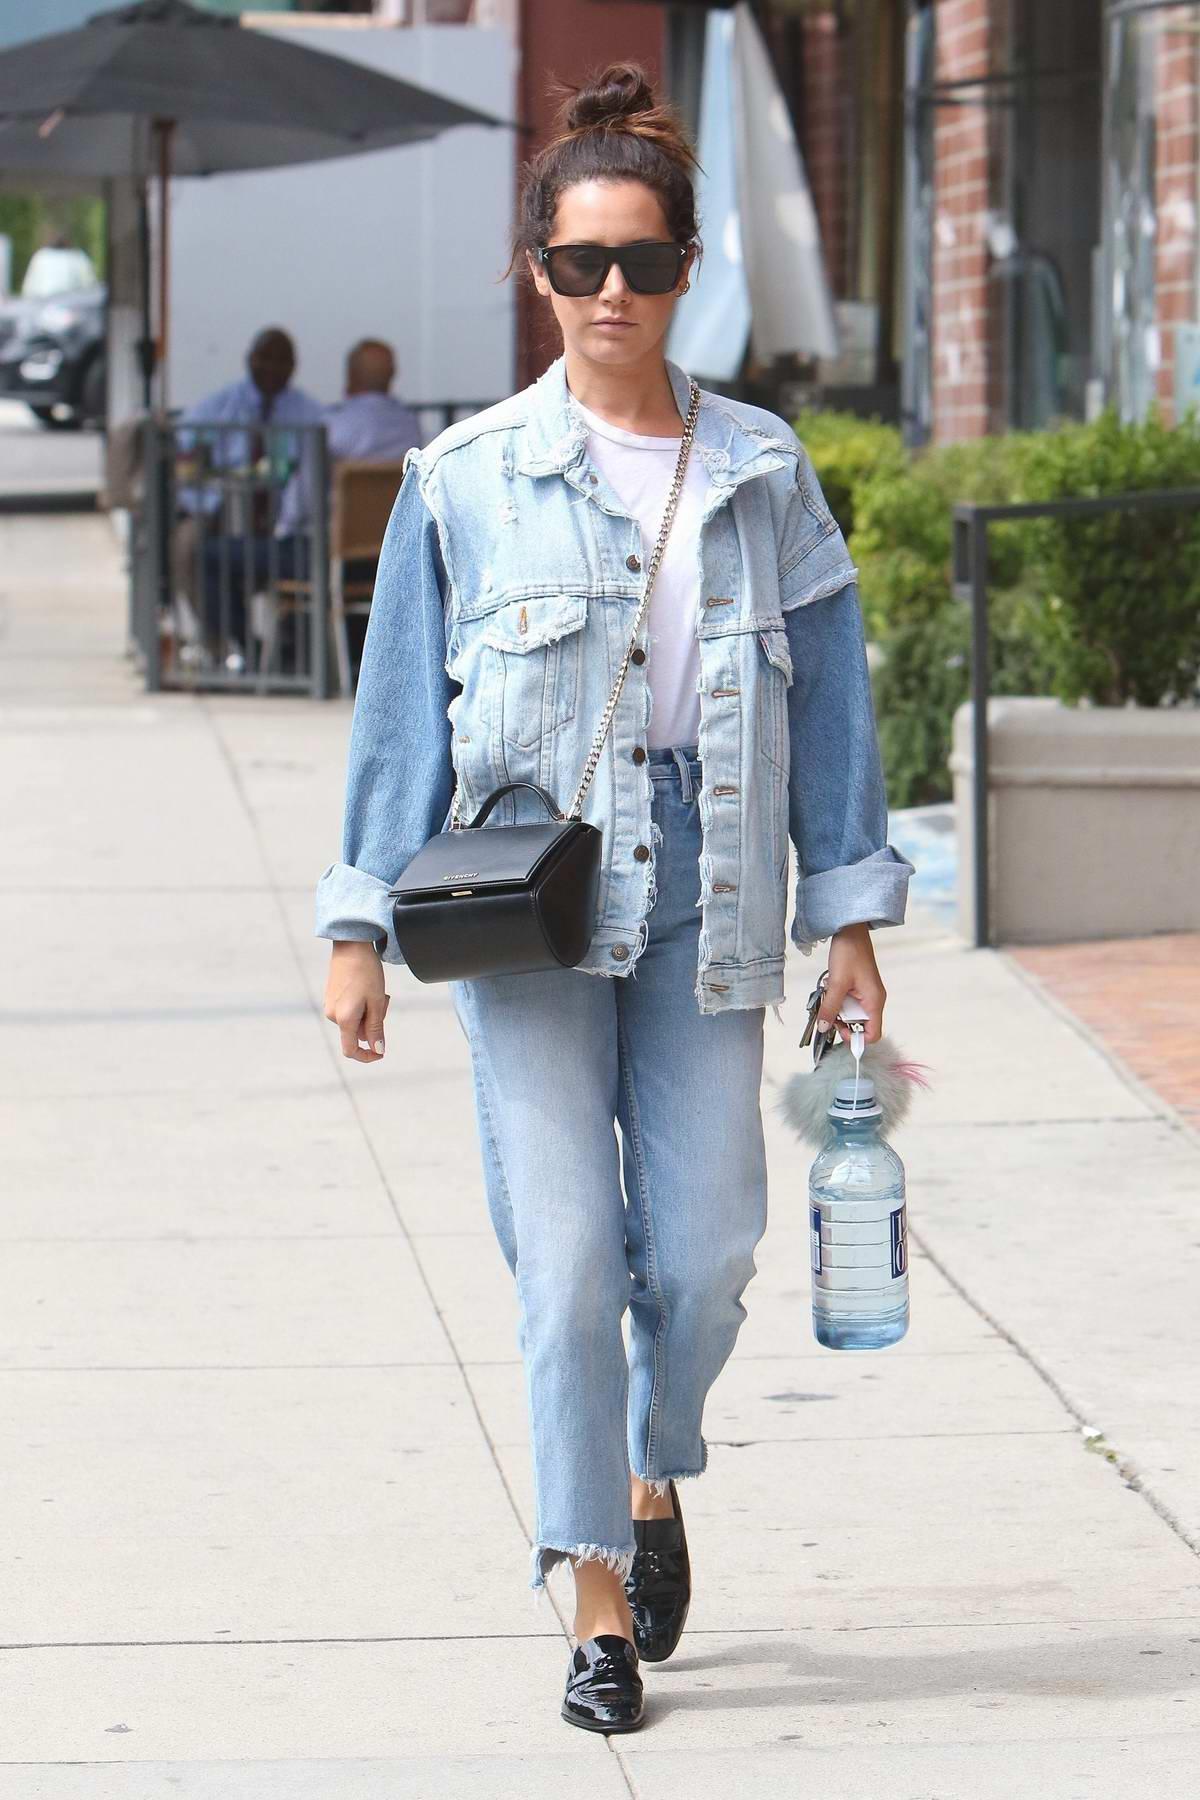 Ashley Tisdale dressed in denim visited Anastasia Beverly Hills in Los Angeles